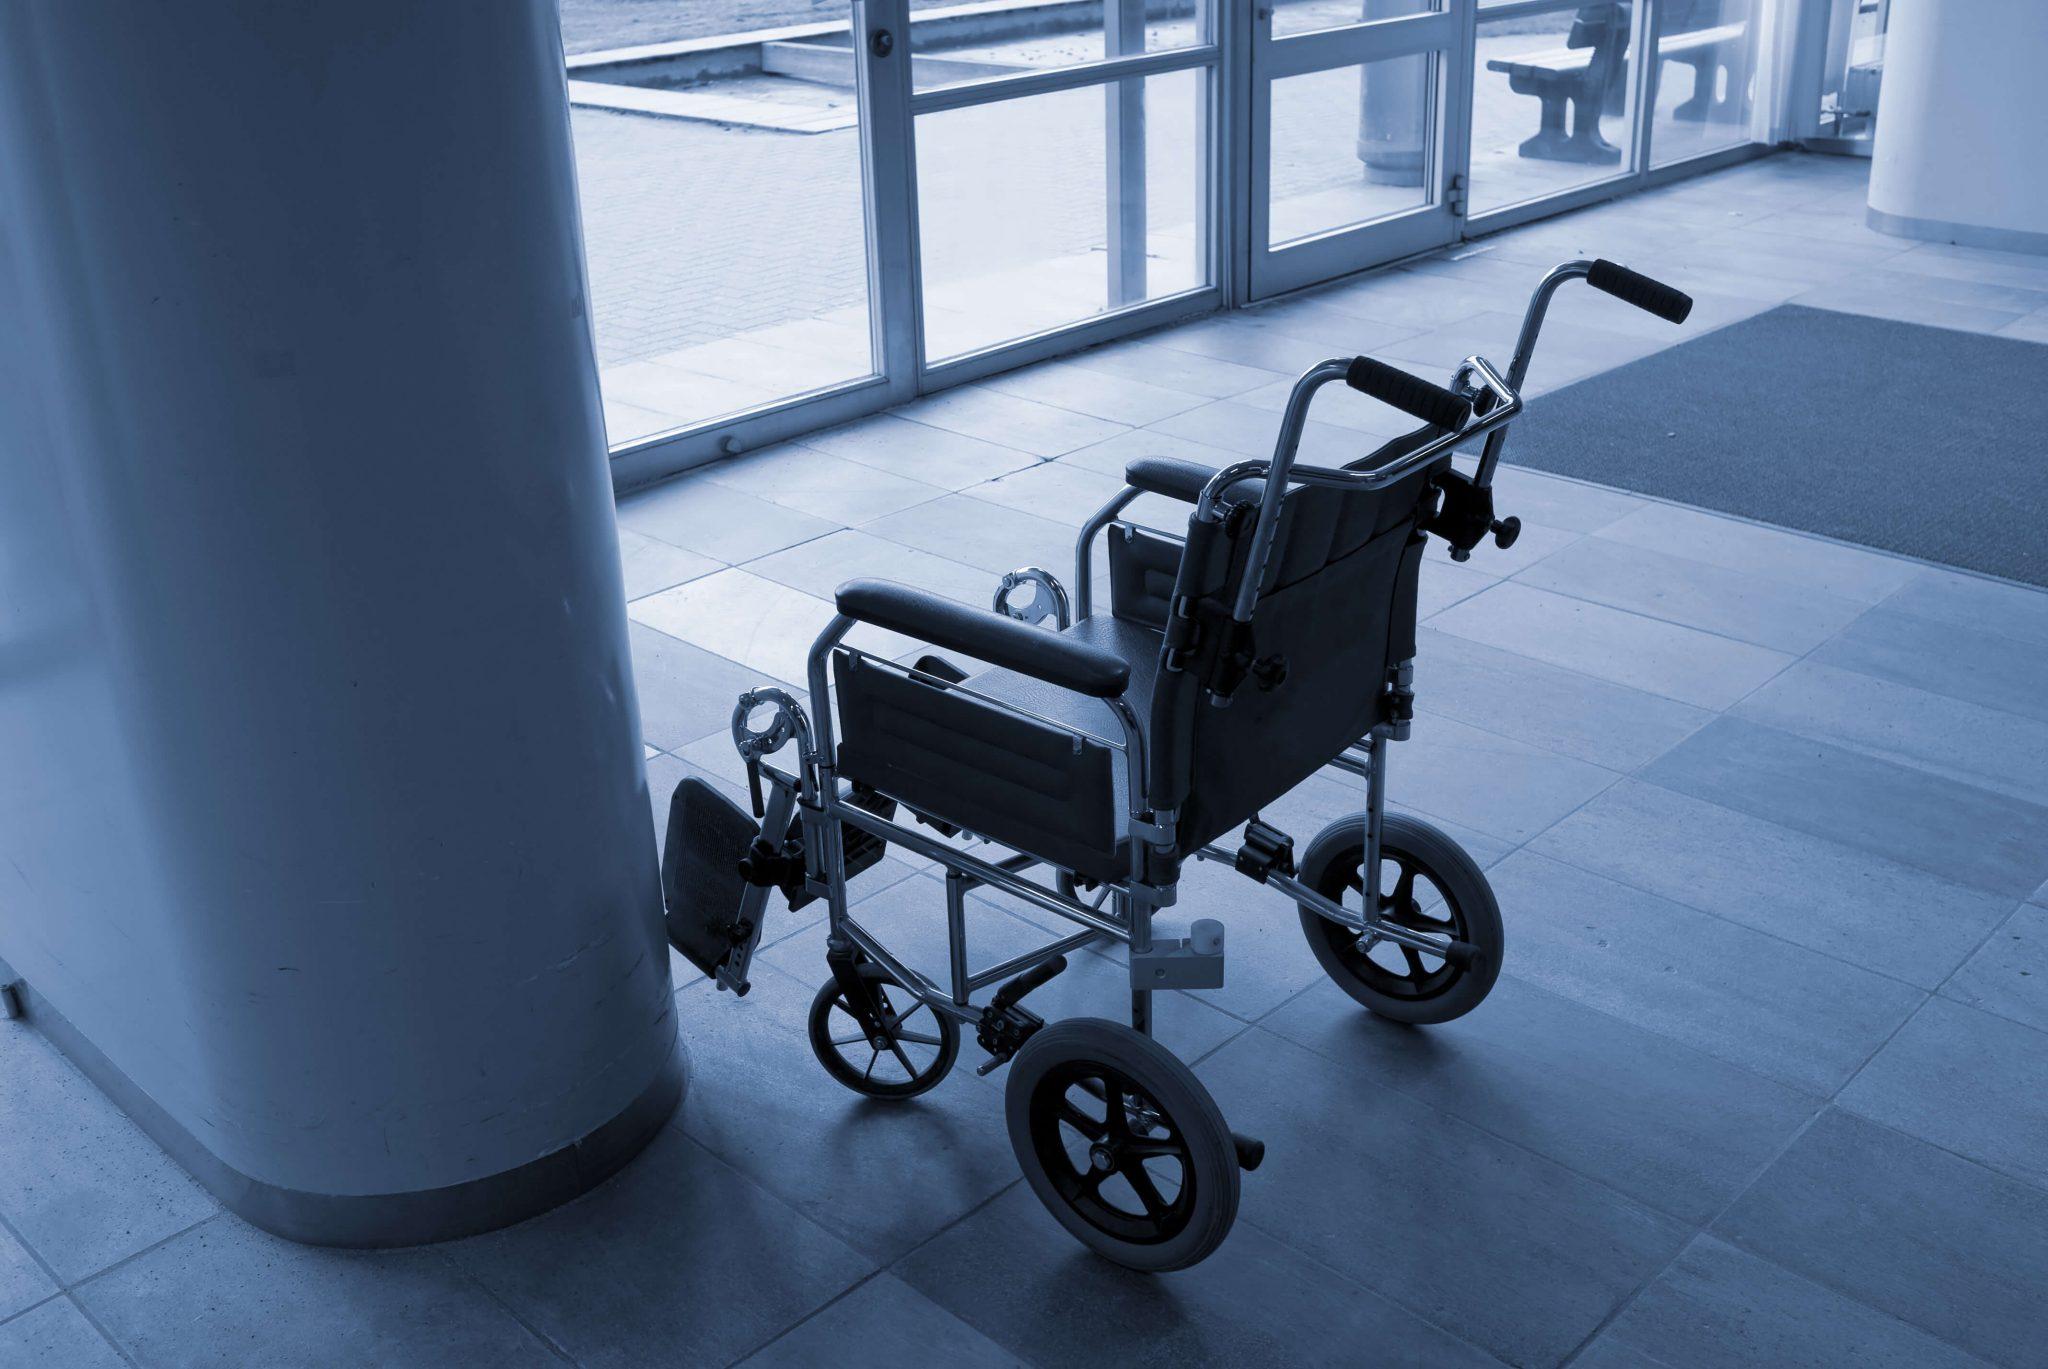 Empty Wheelchair in Philadelphia Hospital